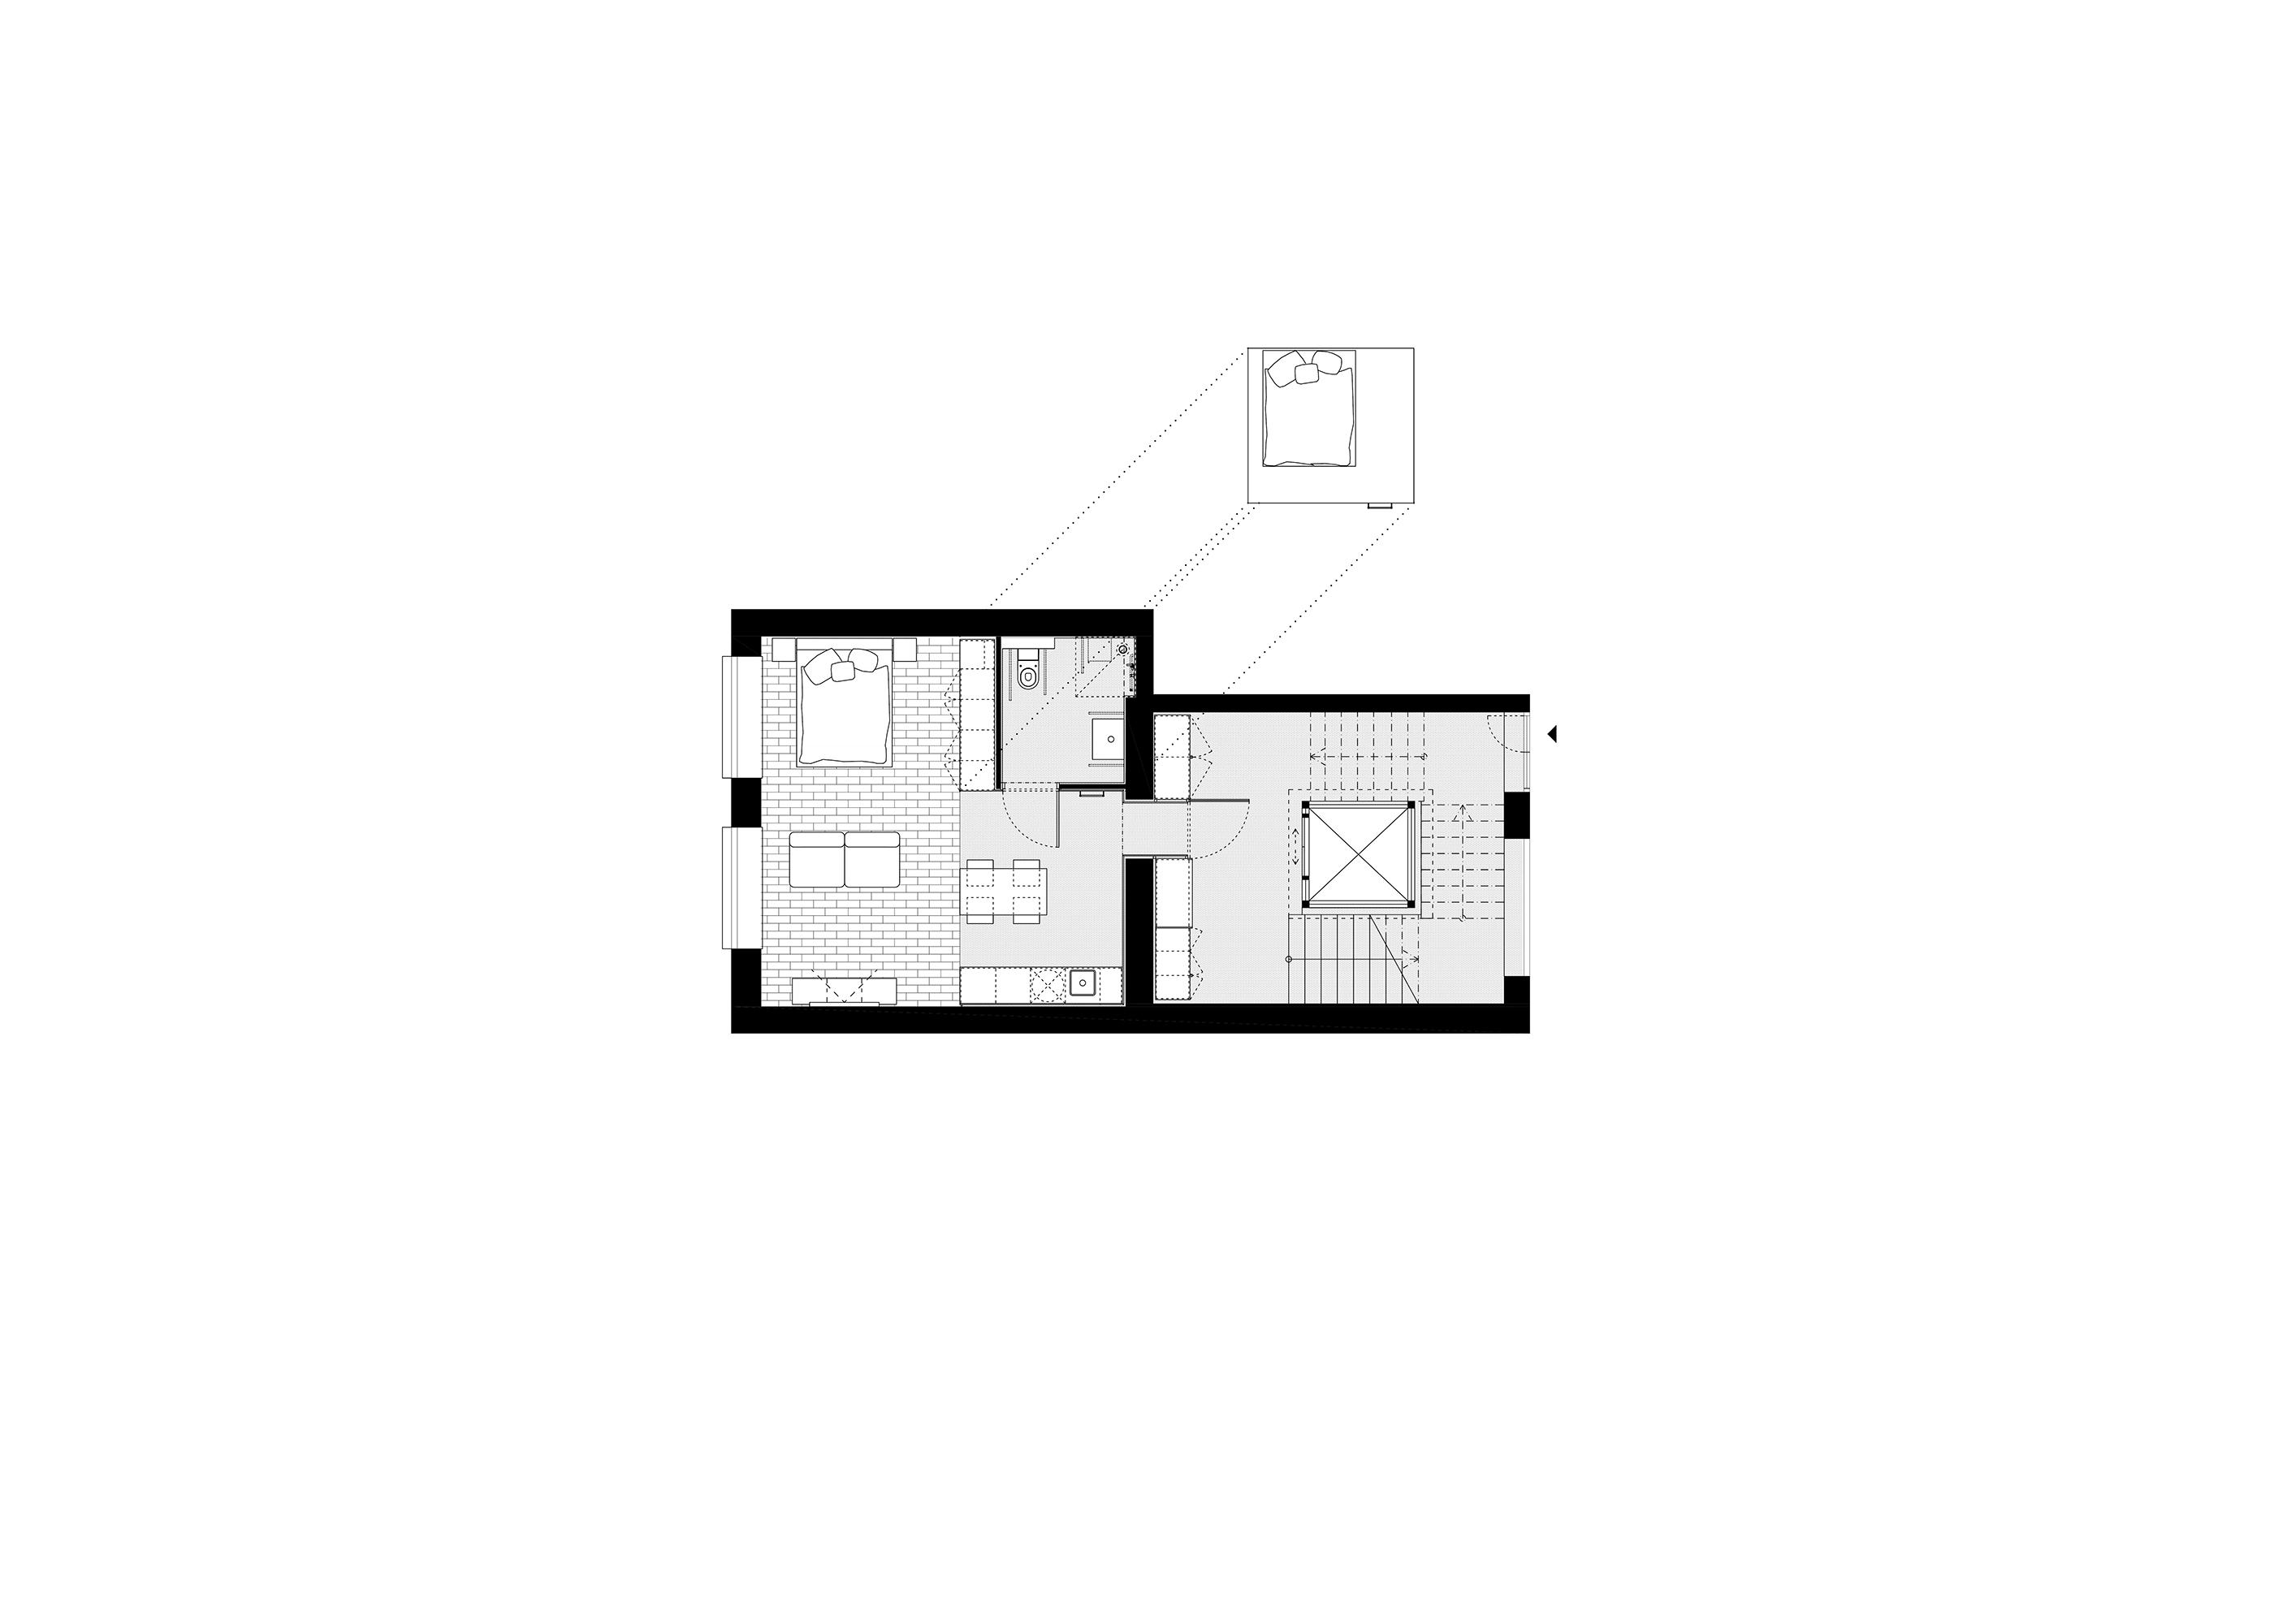 noiz-architekti-bratislava-dom-prilepy-01